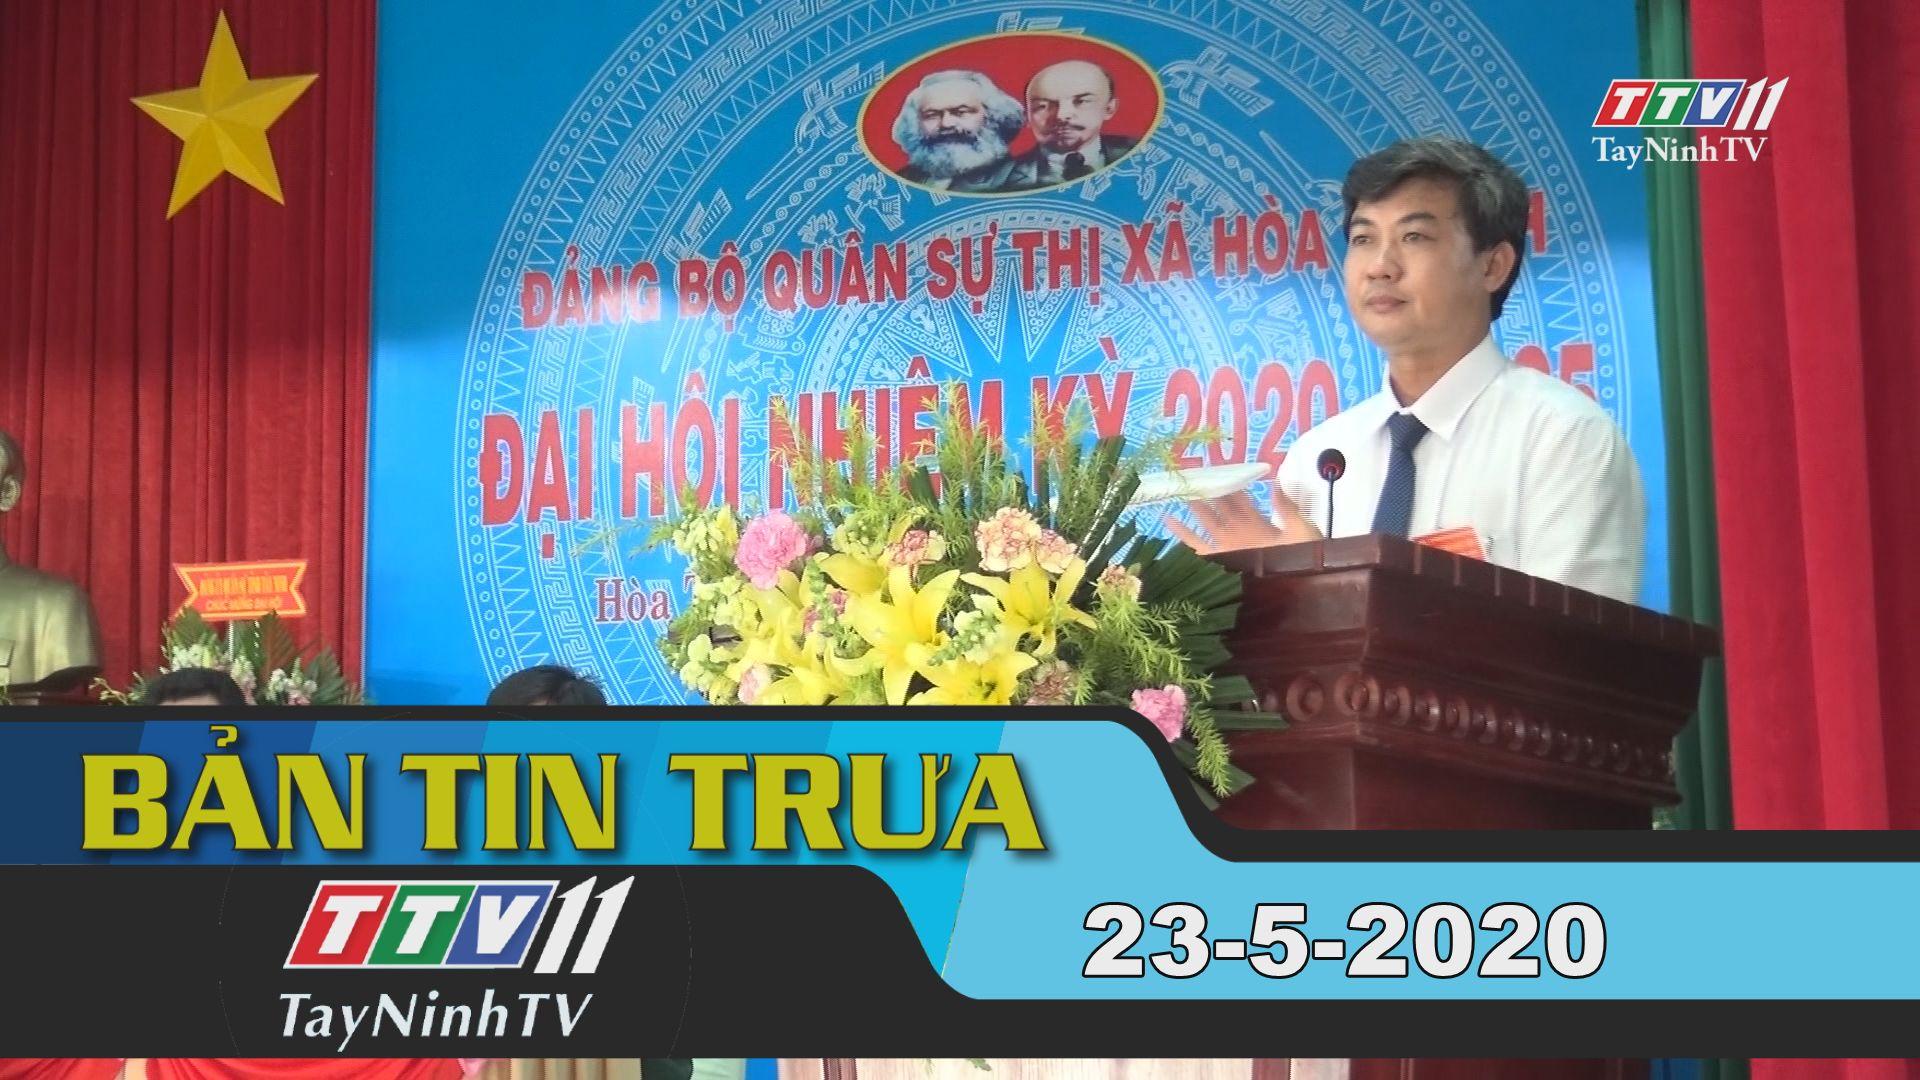 Bản tin trưa 23-5-2020 | Tin tức hôm nay | TayNinhTV